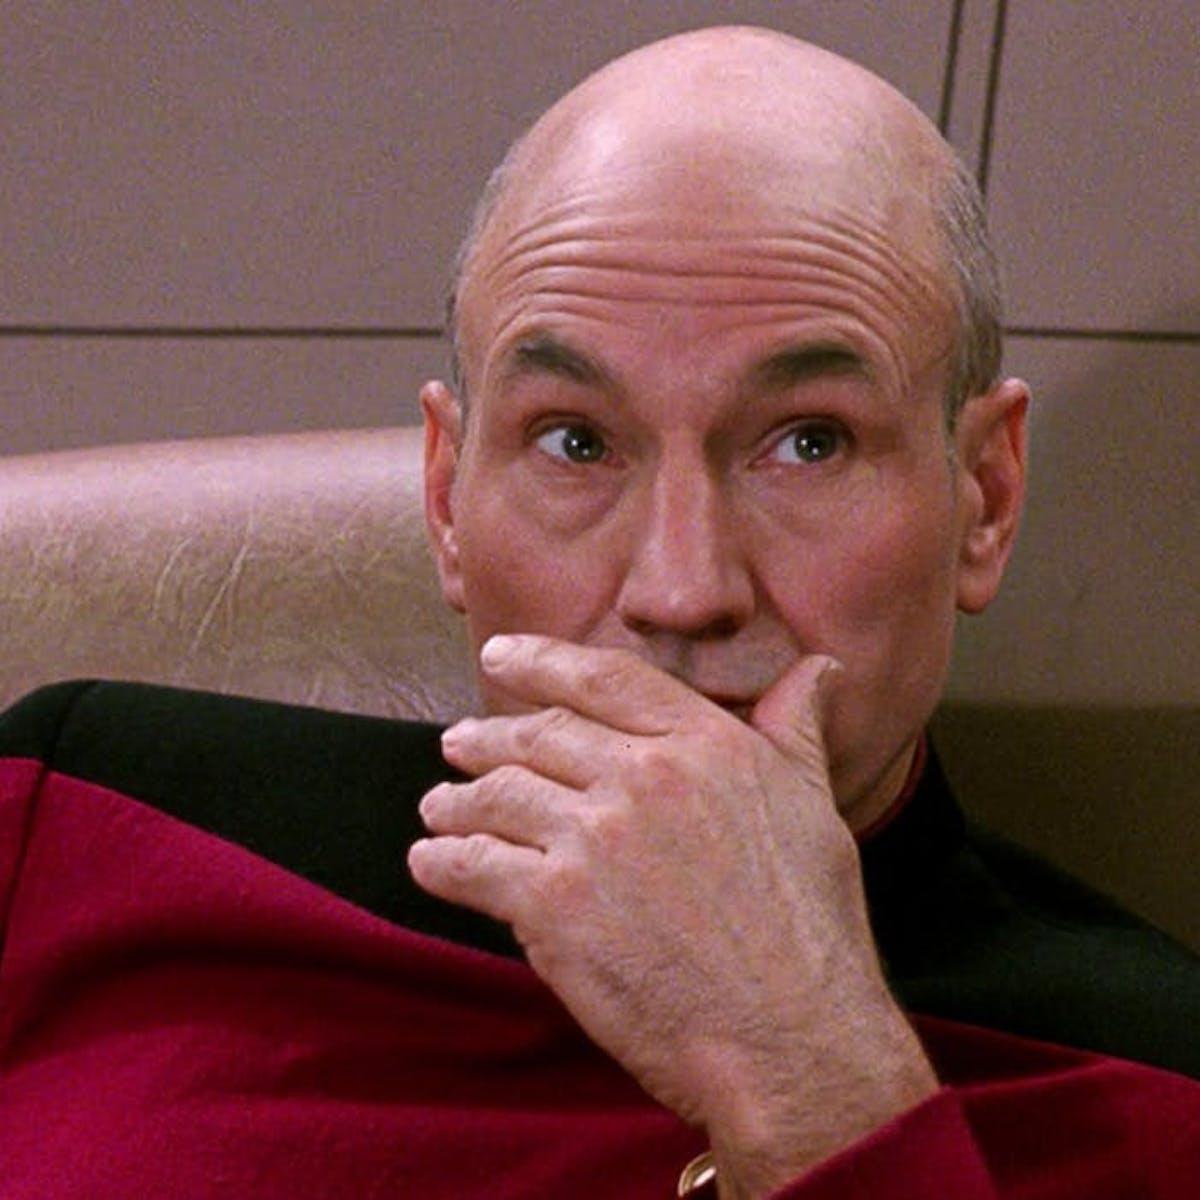 Star Trek: TNG' Honest Trailer Gets One Thing Hilariously